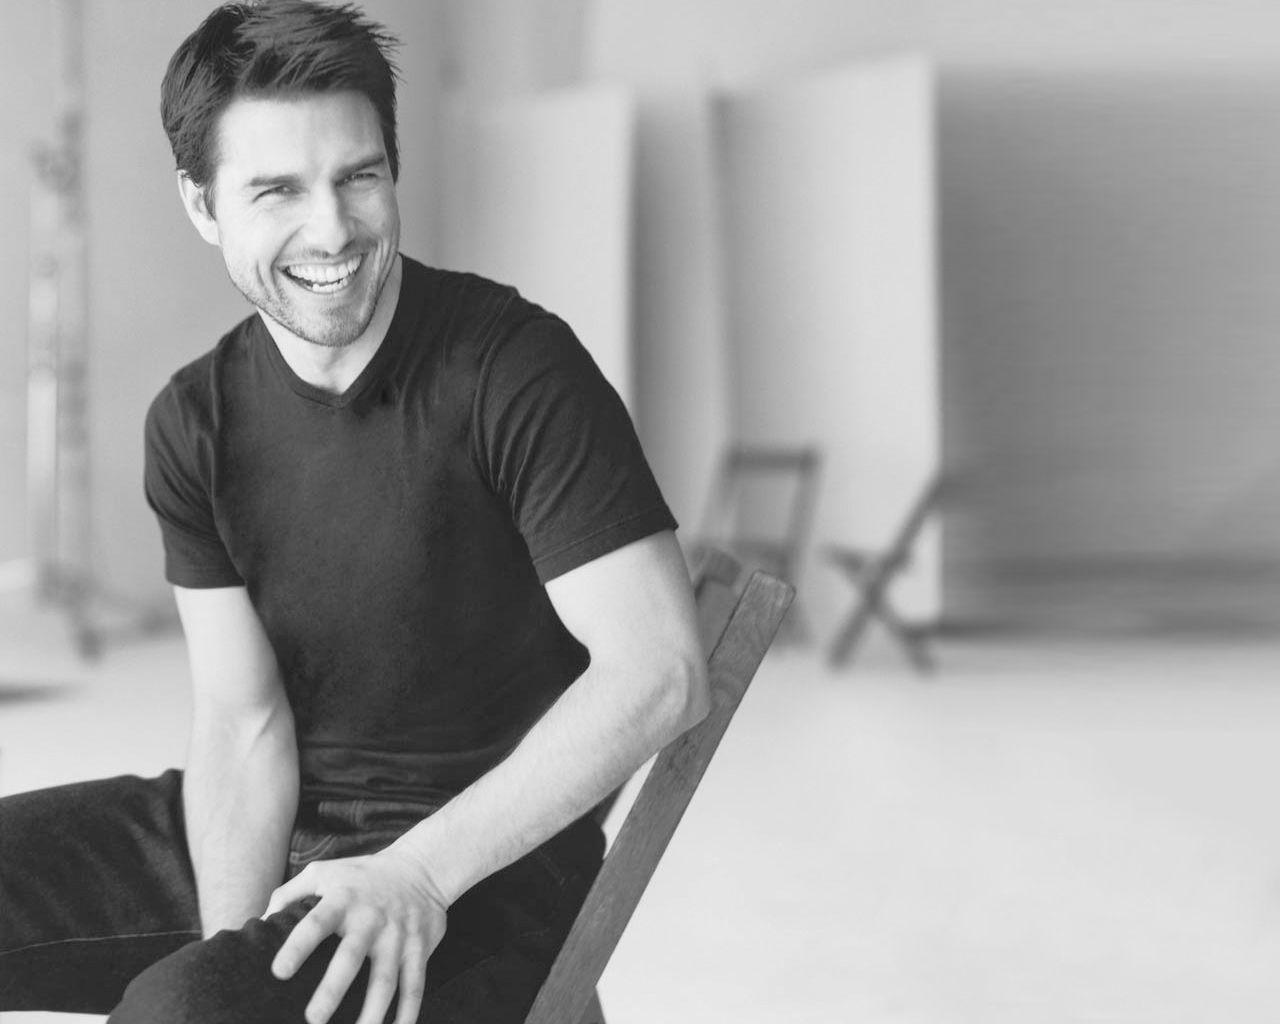 Tom Cruise On Chair Monochrome Wallpaper 1280x1024